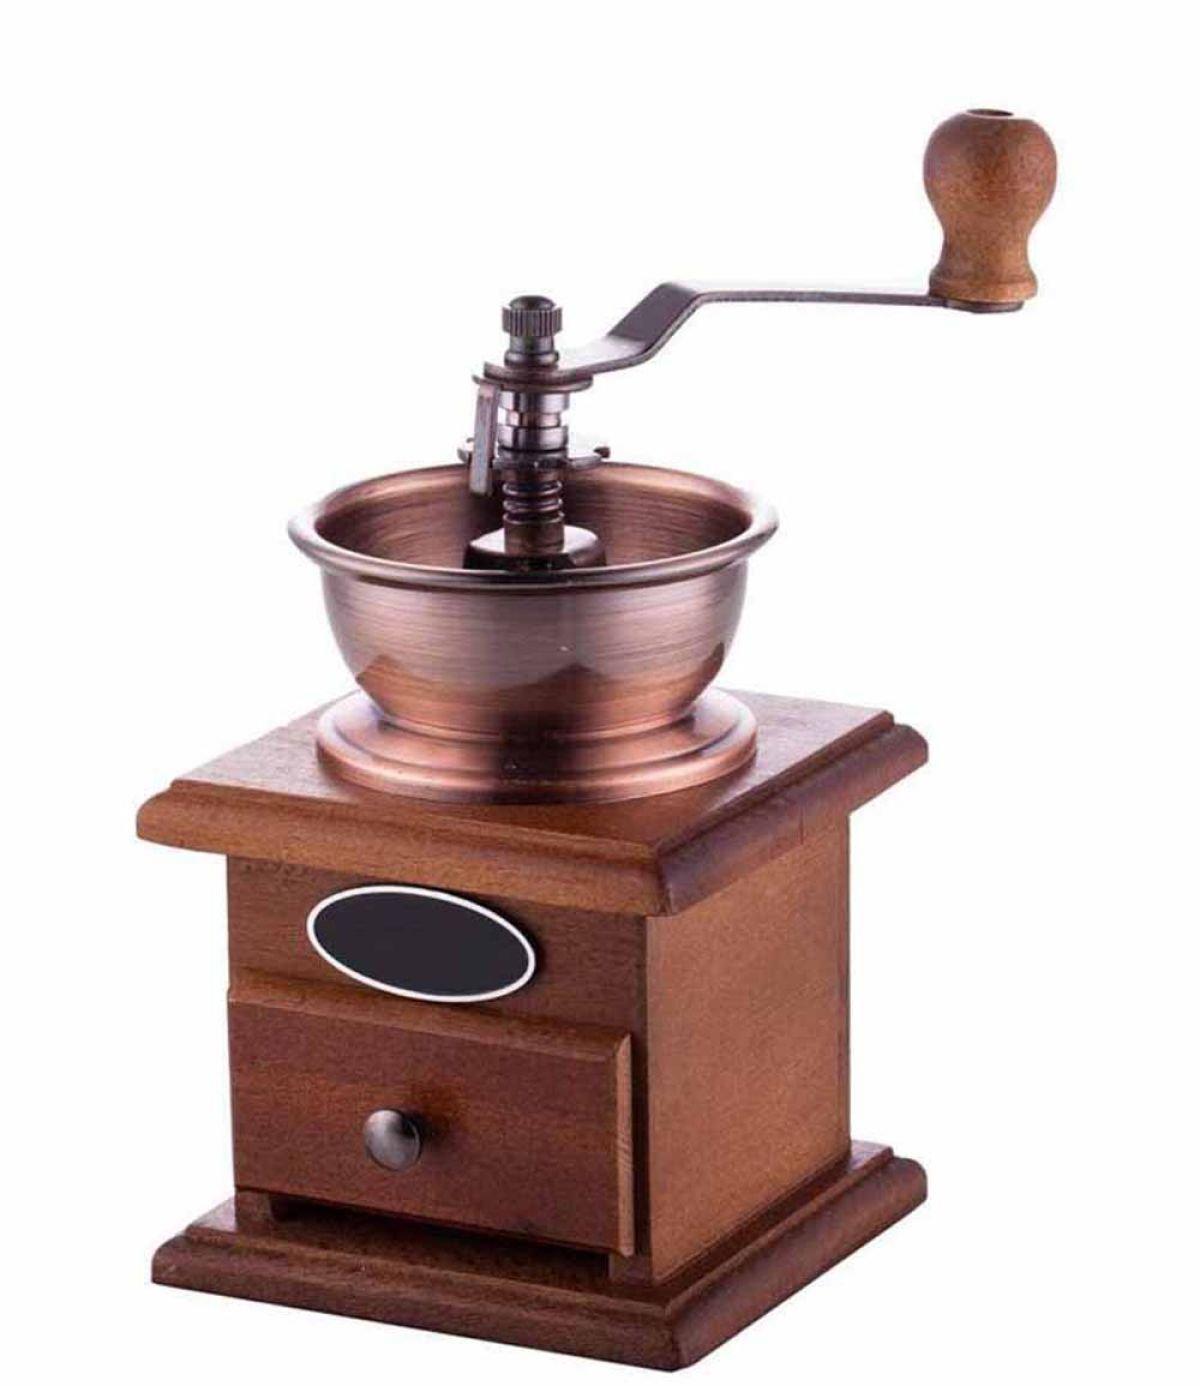 Glitch Vintage-Holz-Handschleifer Kaffeemühle Mini-Haus